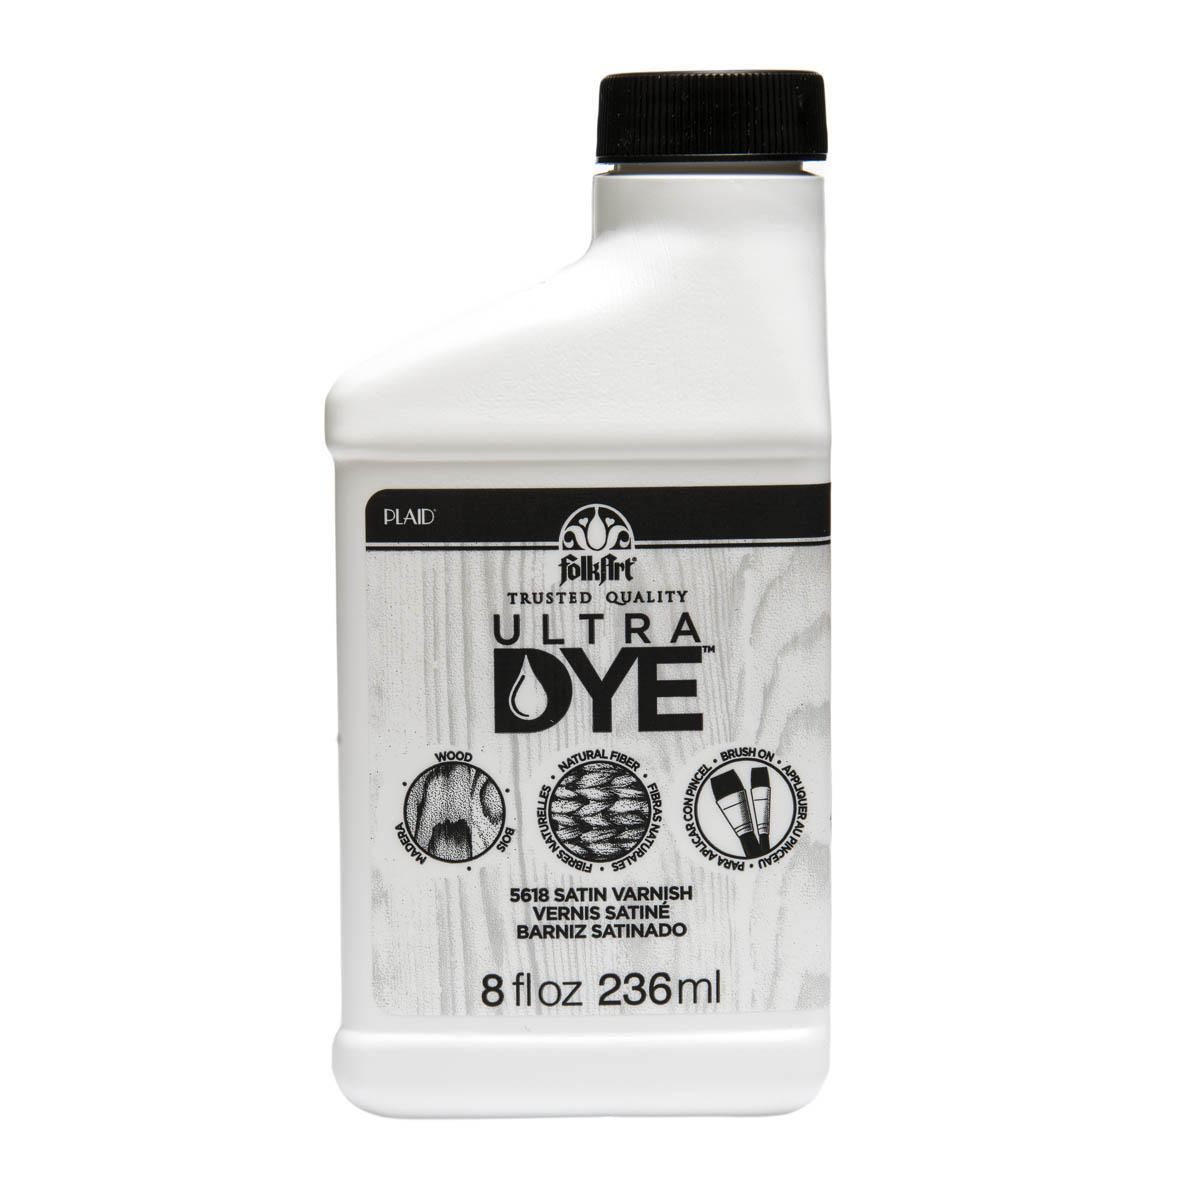 FolkArt ® Ultra Dye™ Satin Varnish, 8 oz.